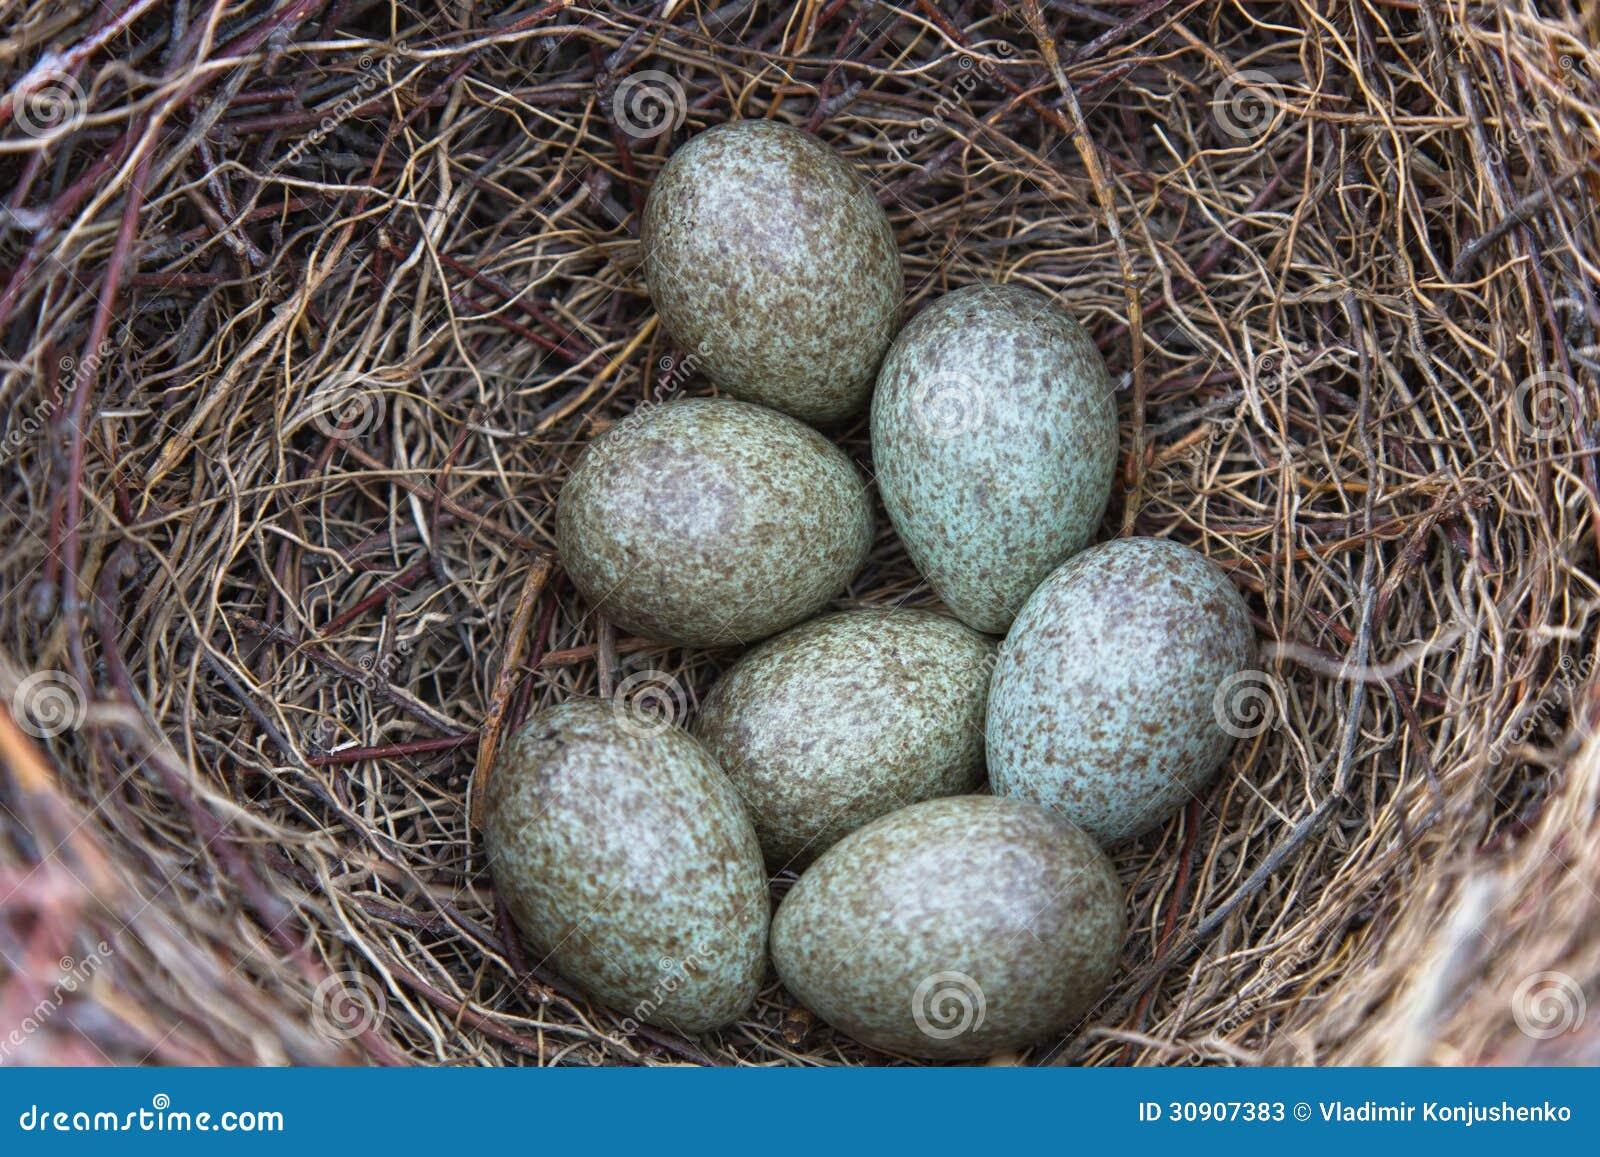 Magpie Eggs Stock Photos Image 30907383